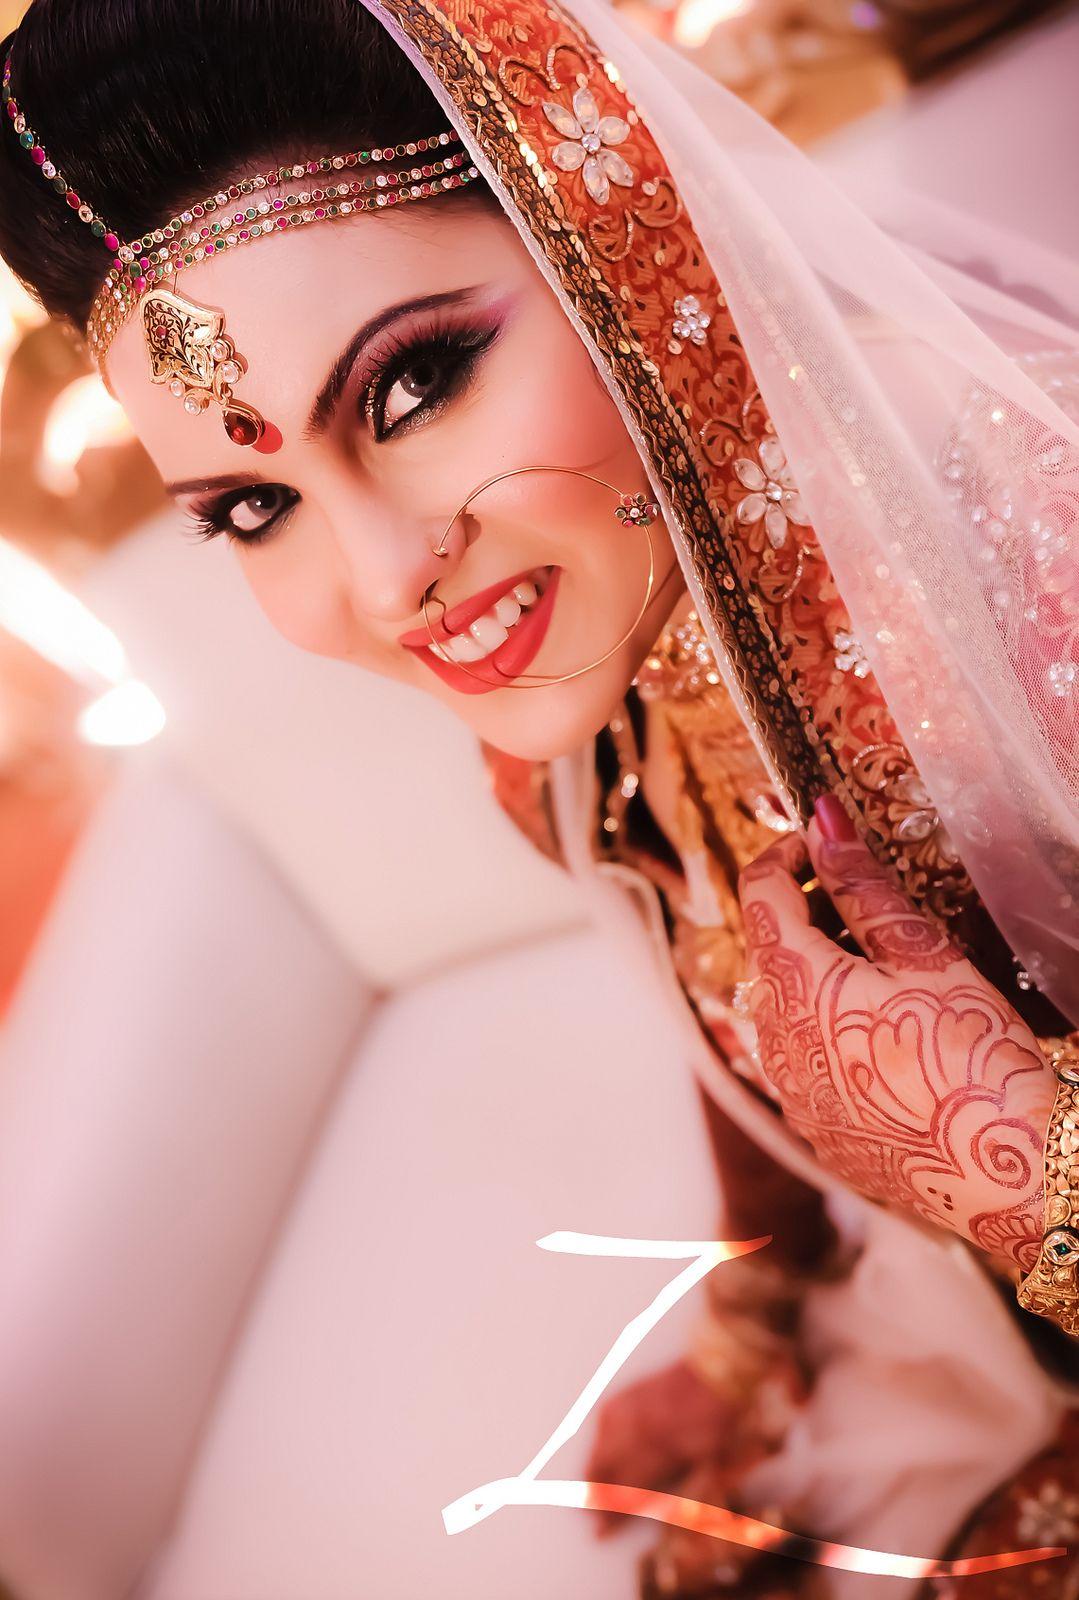 Bangladesh Bride with white veil #Bengali wedding | Bedazzled ...